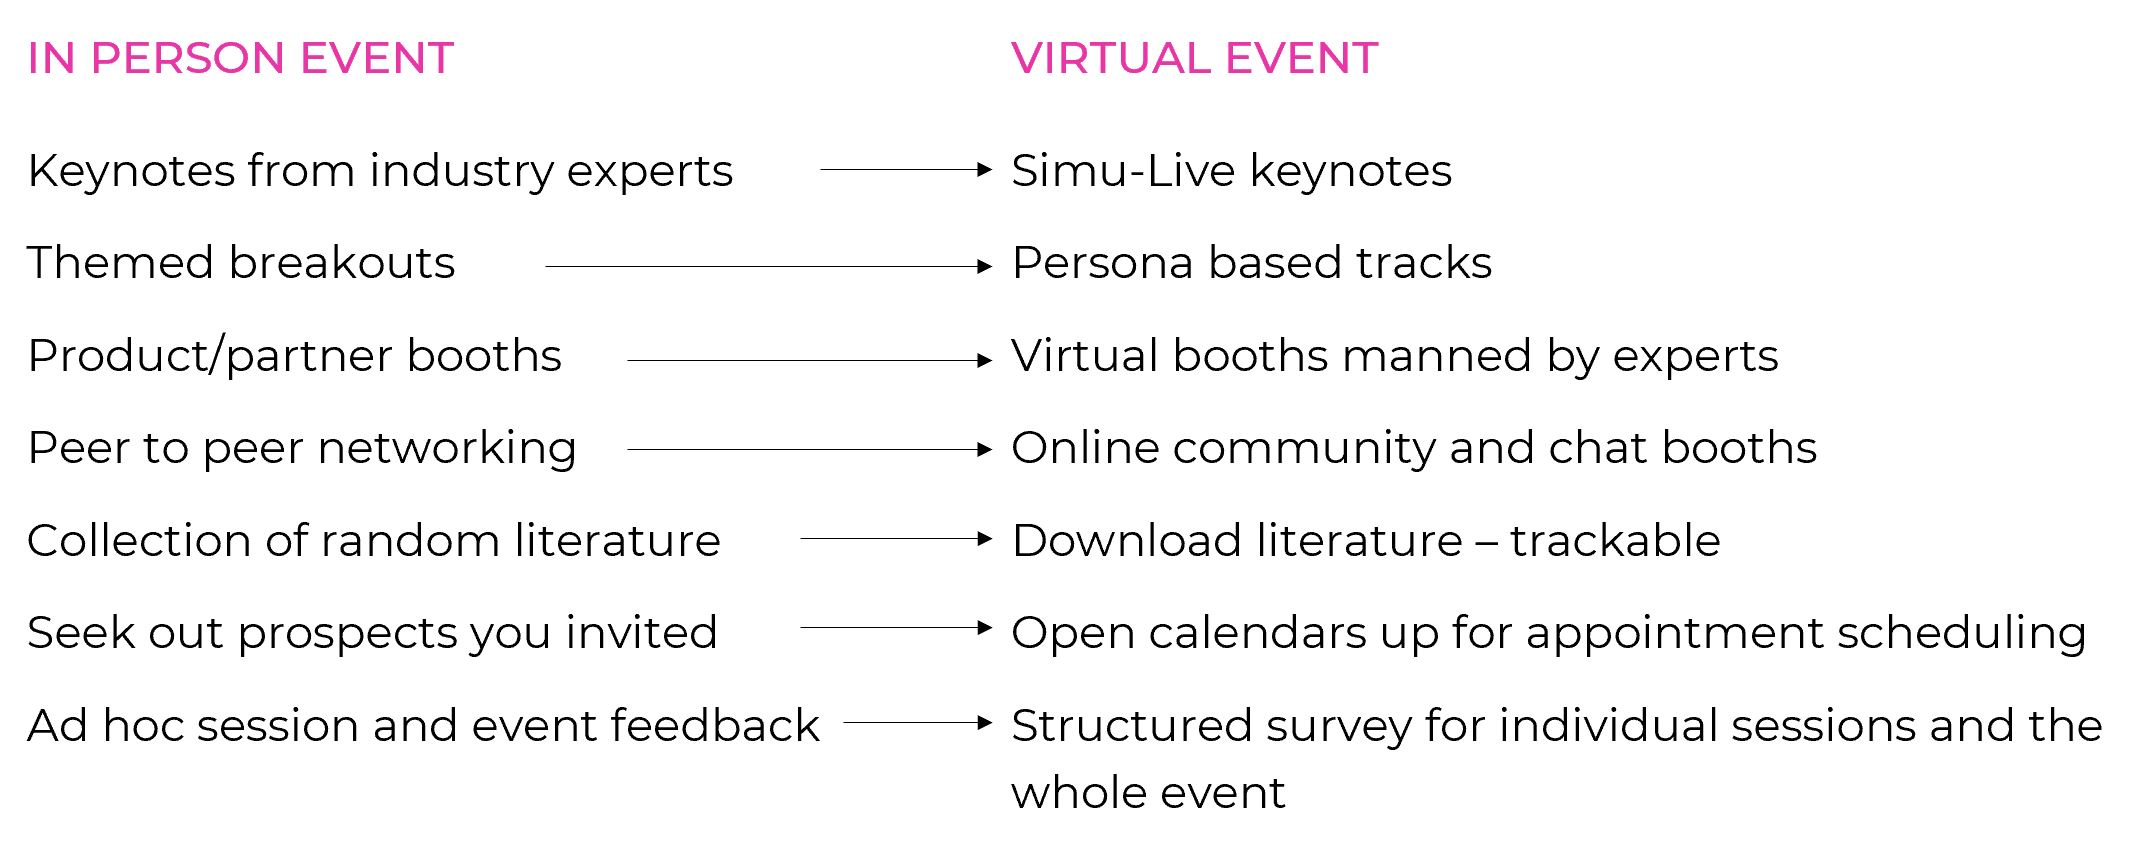 In-Person vs Virtual Event Experience